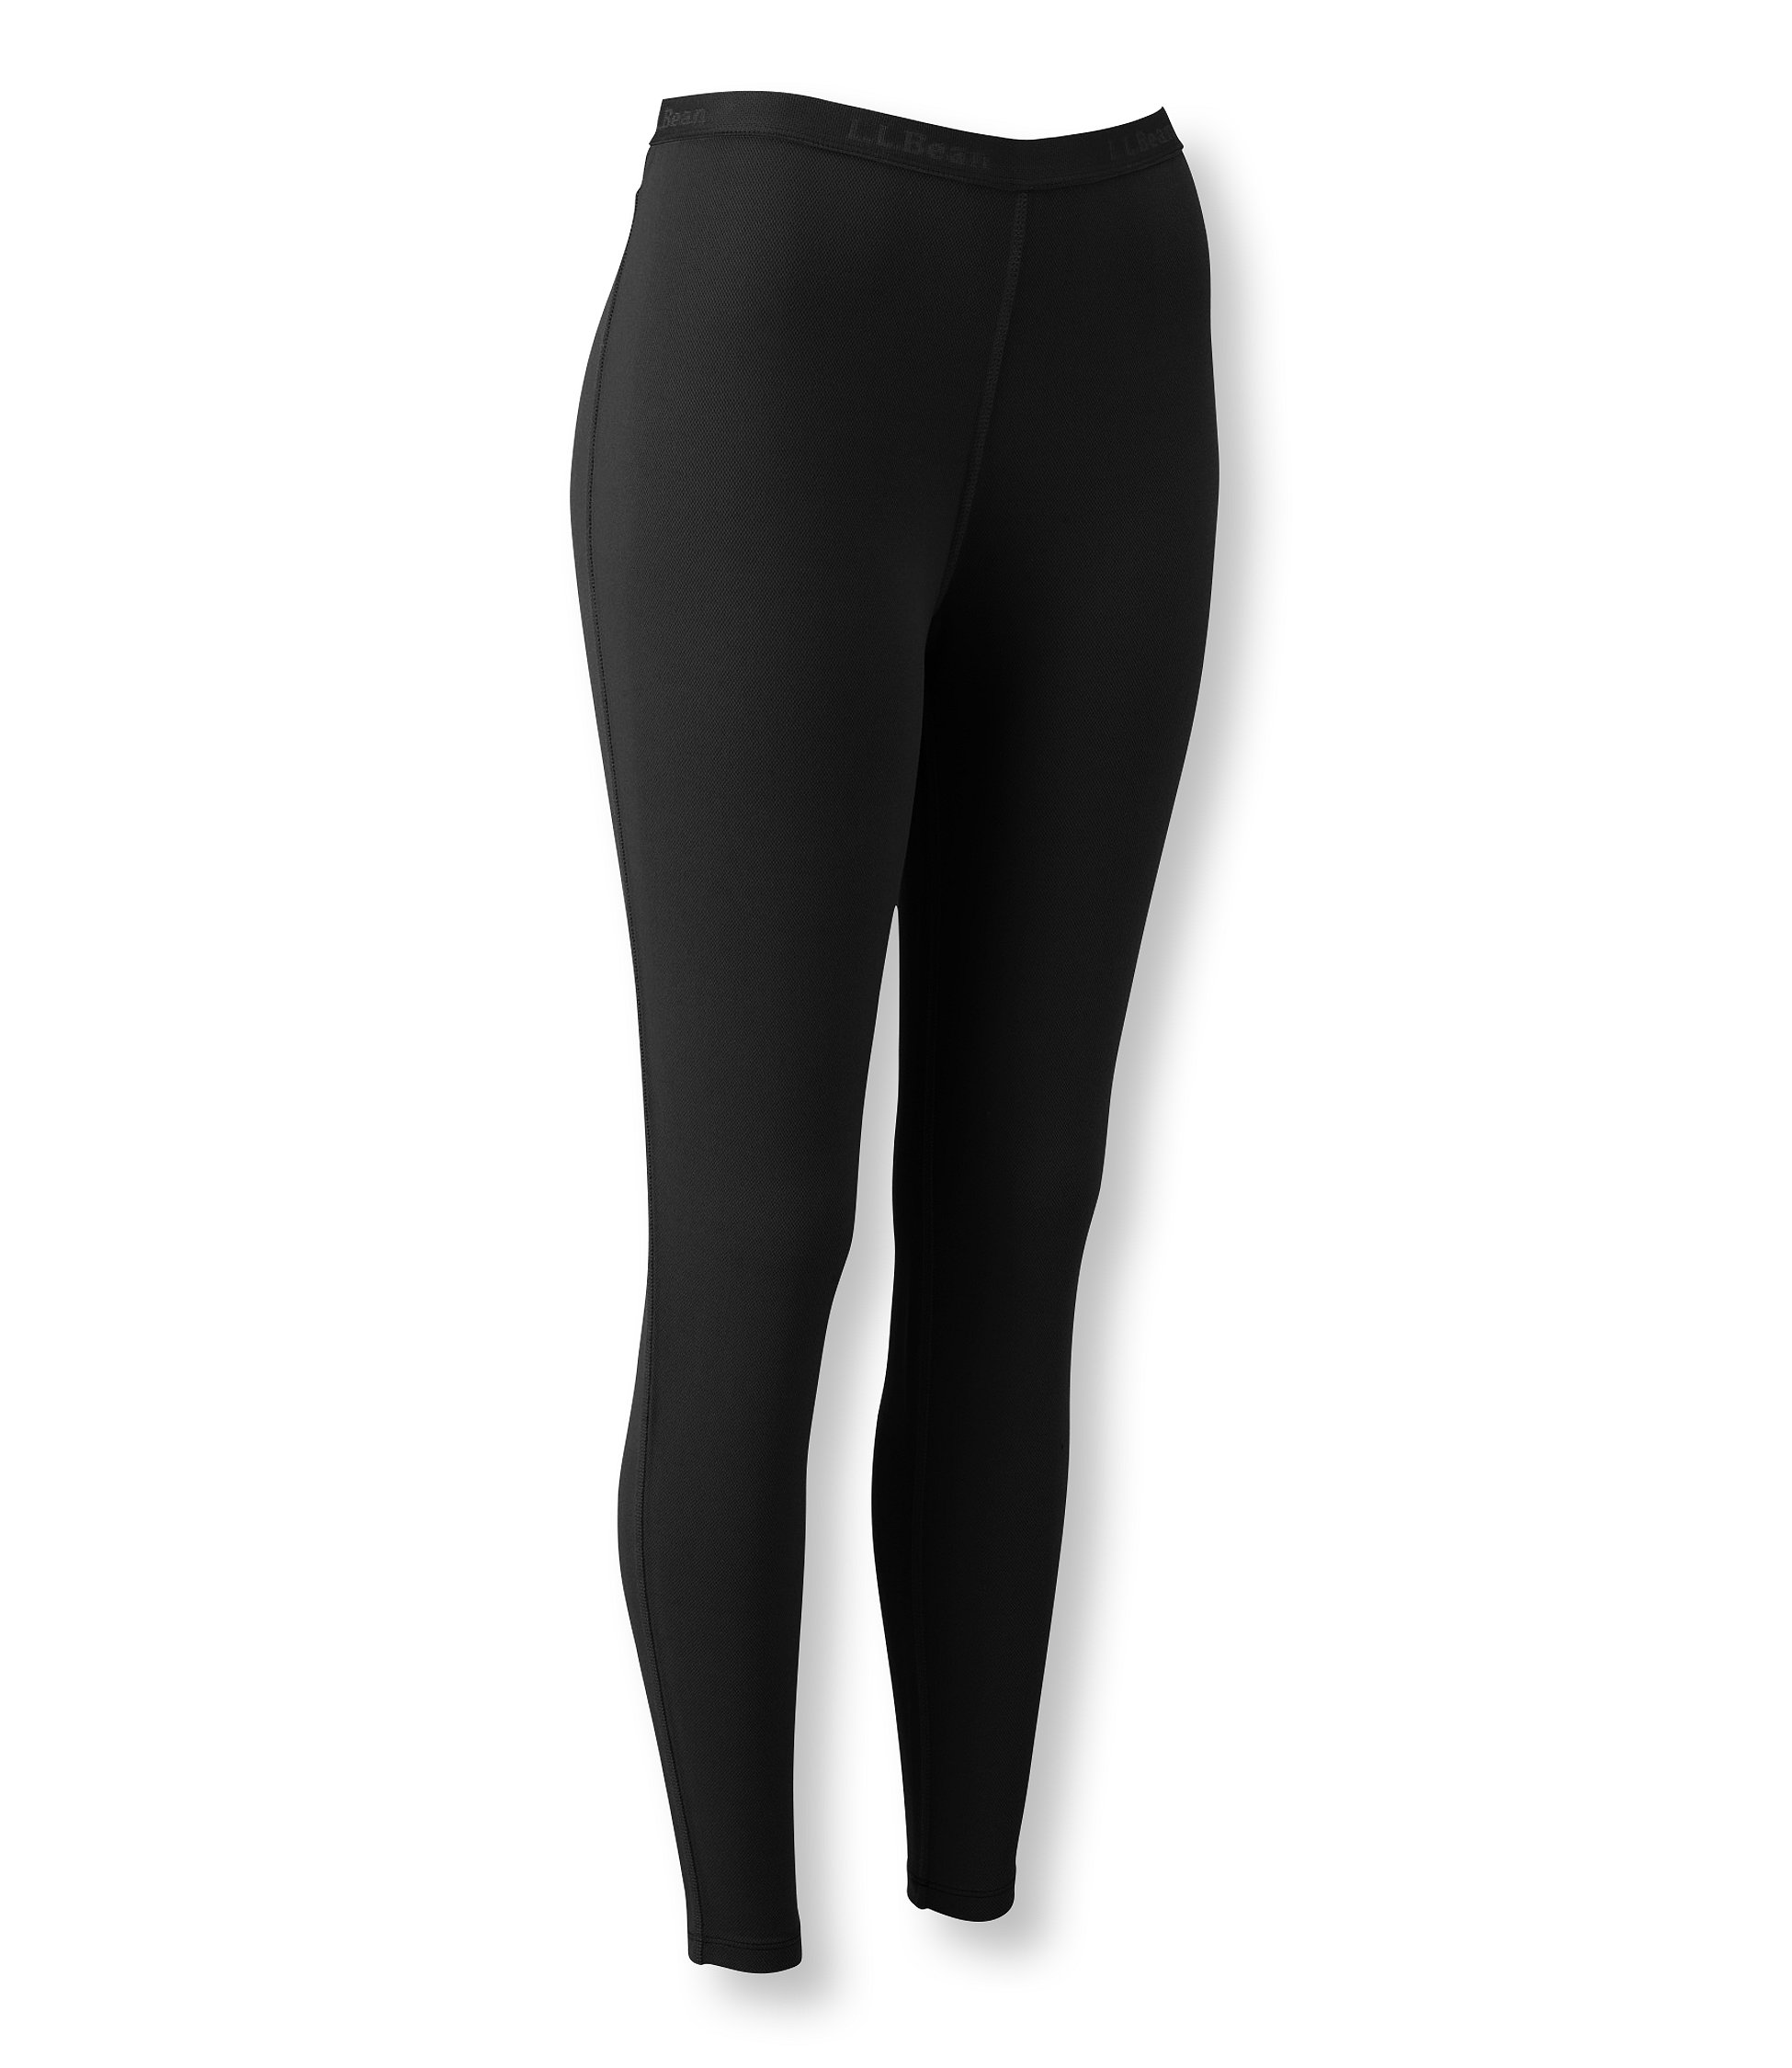 photo: L.L.Bean Women's Power Dry Stretch Base Layer, Midweight Pants base layer bottom